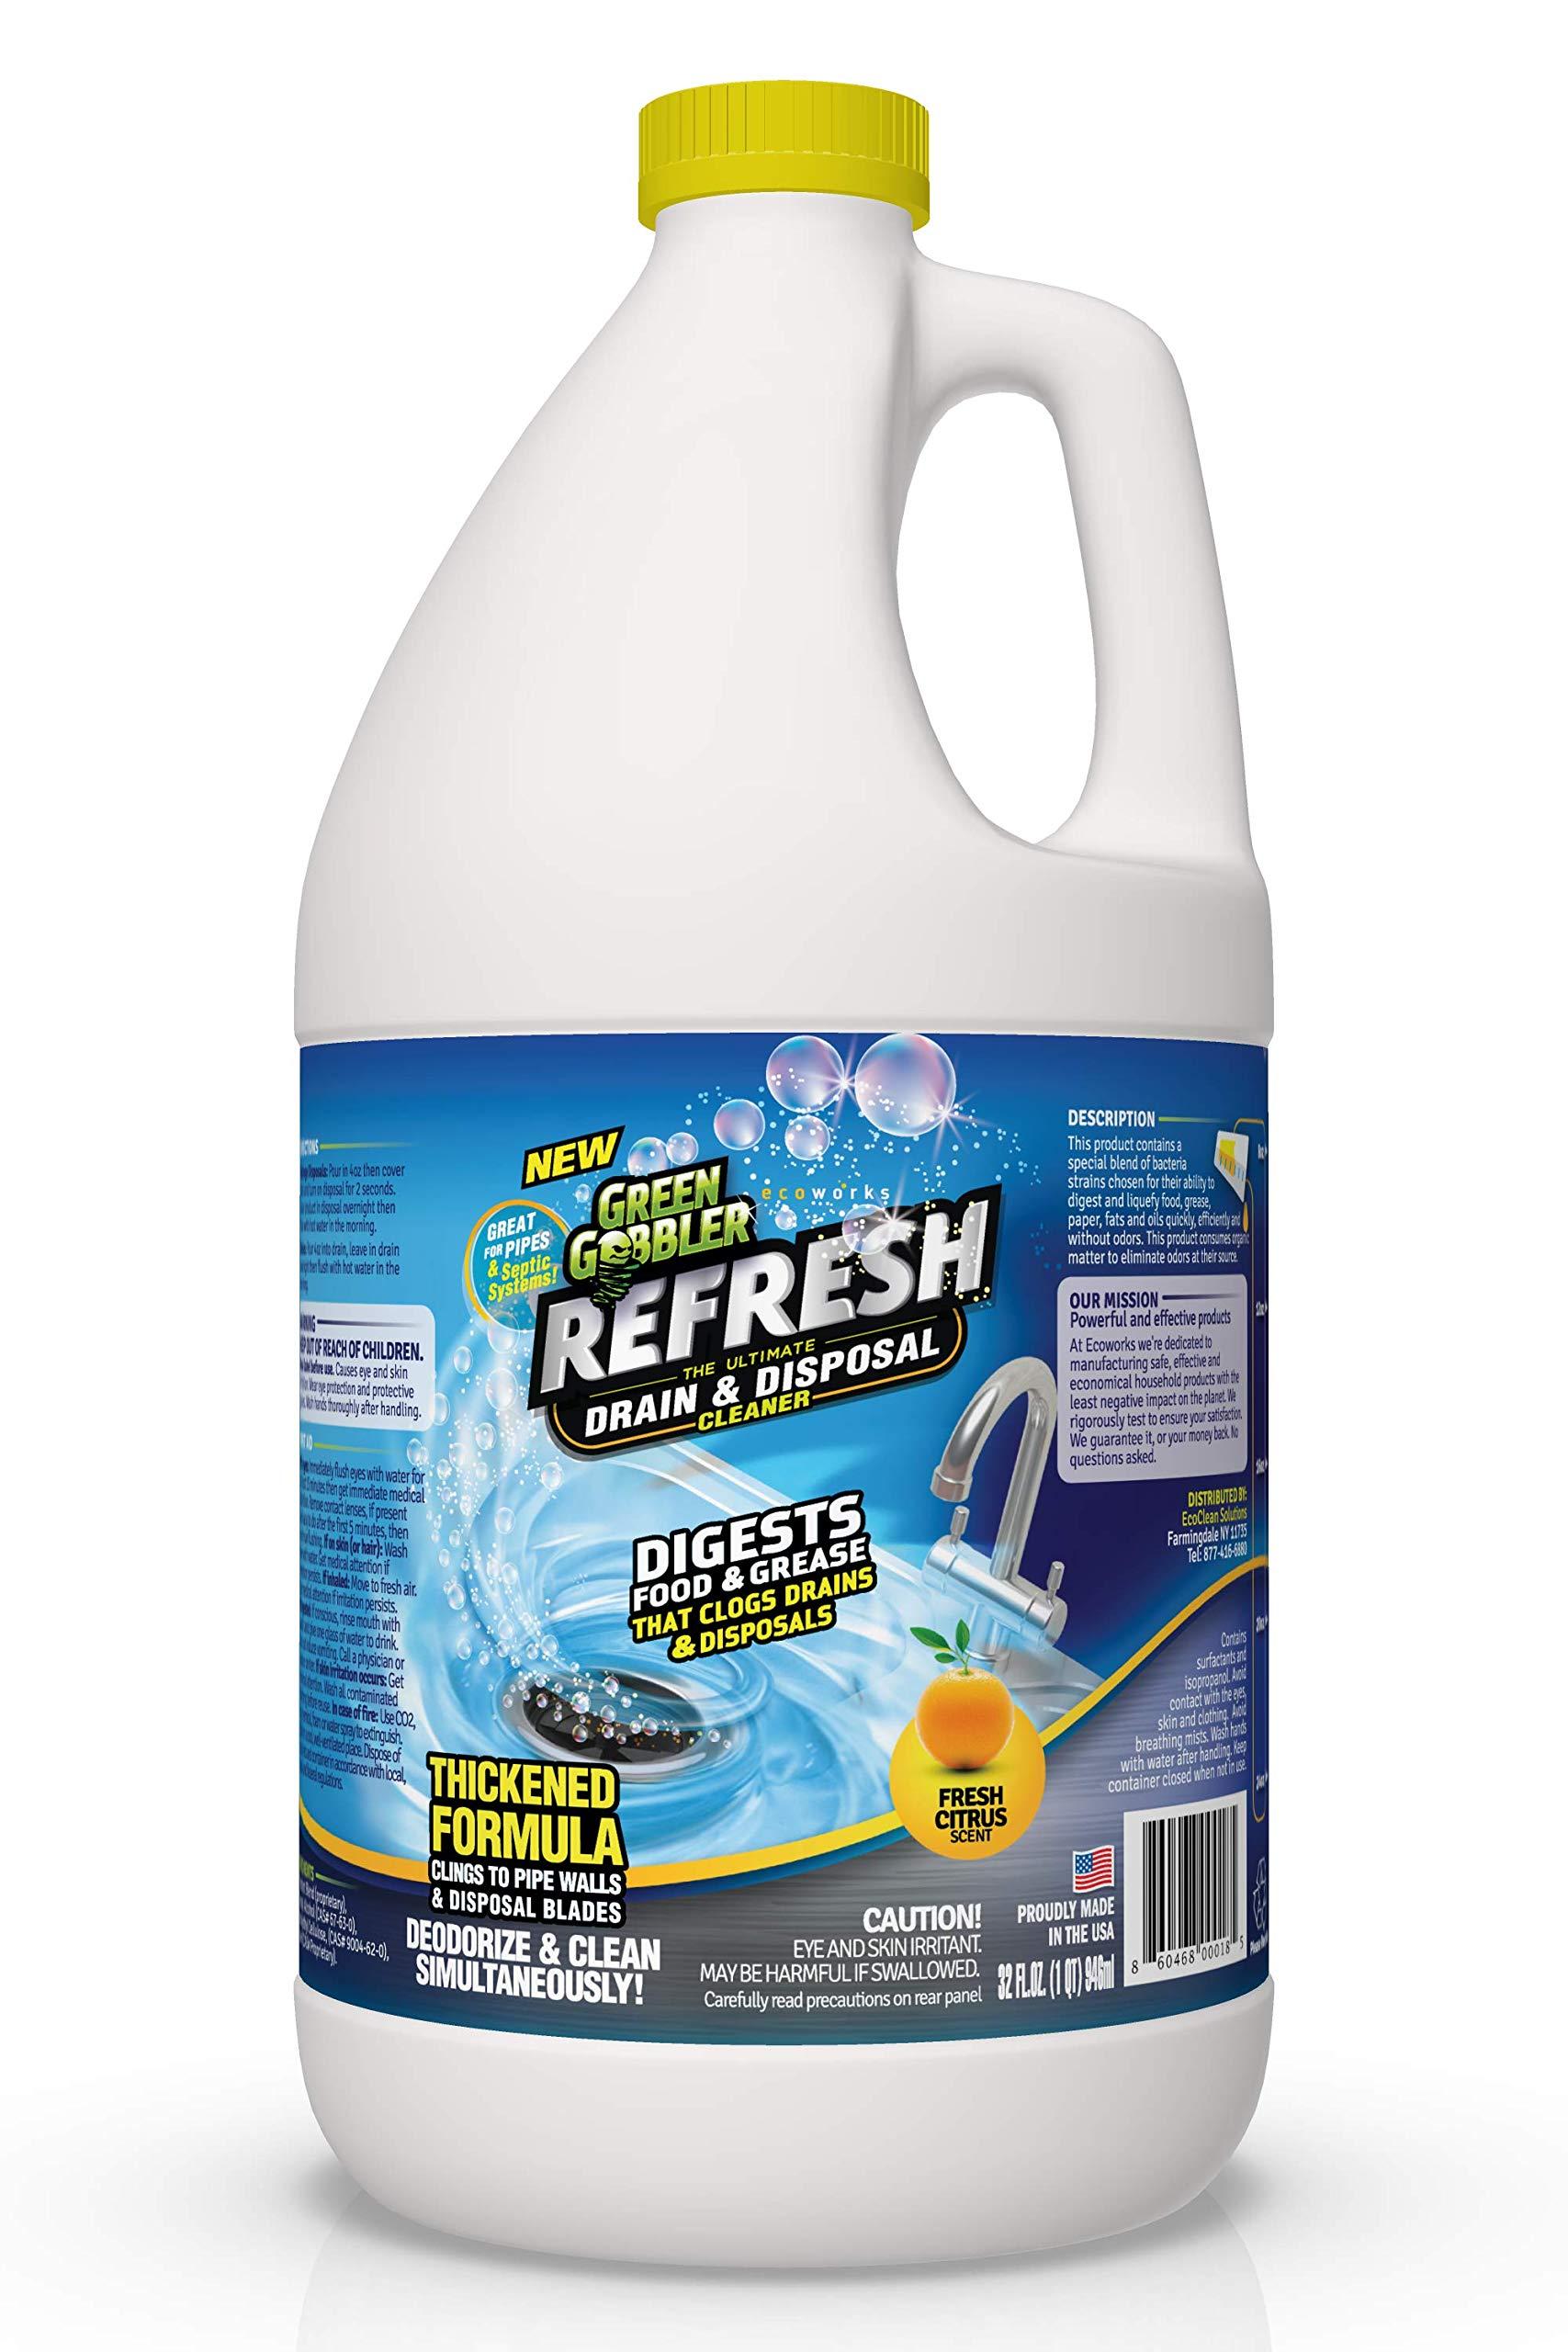 Green Gobbler ''Refresh Garbage Disposal & Drain Cleaner & Deodorizer (1 Gallon) by Green Gobbler (Image #1)